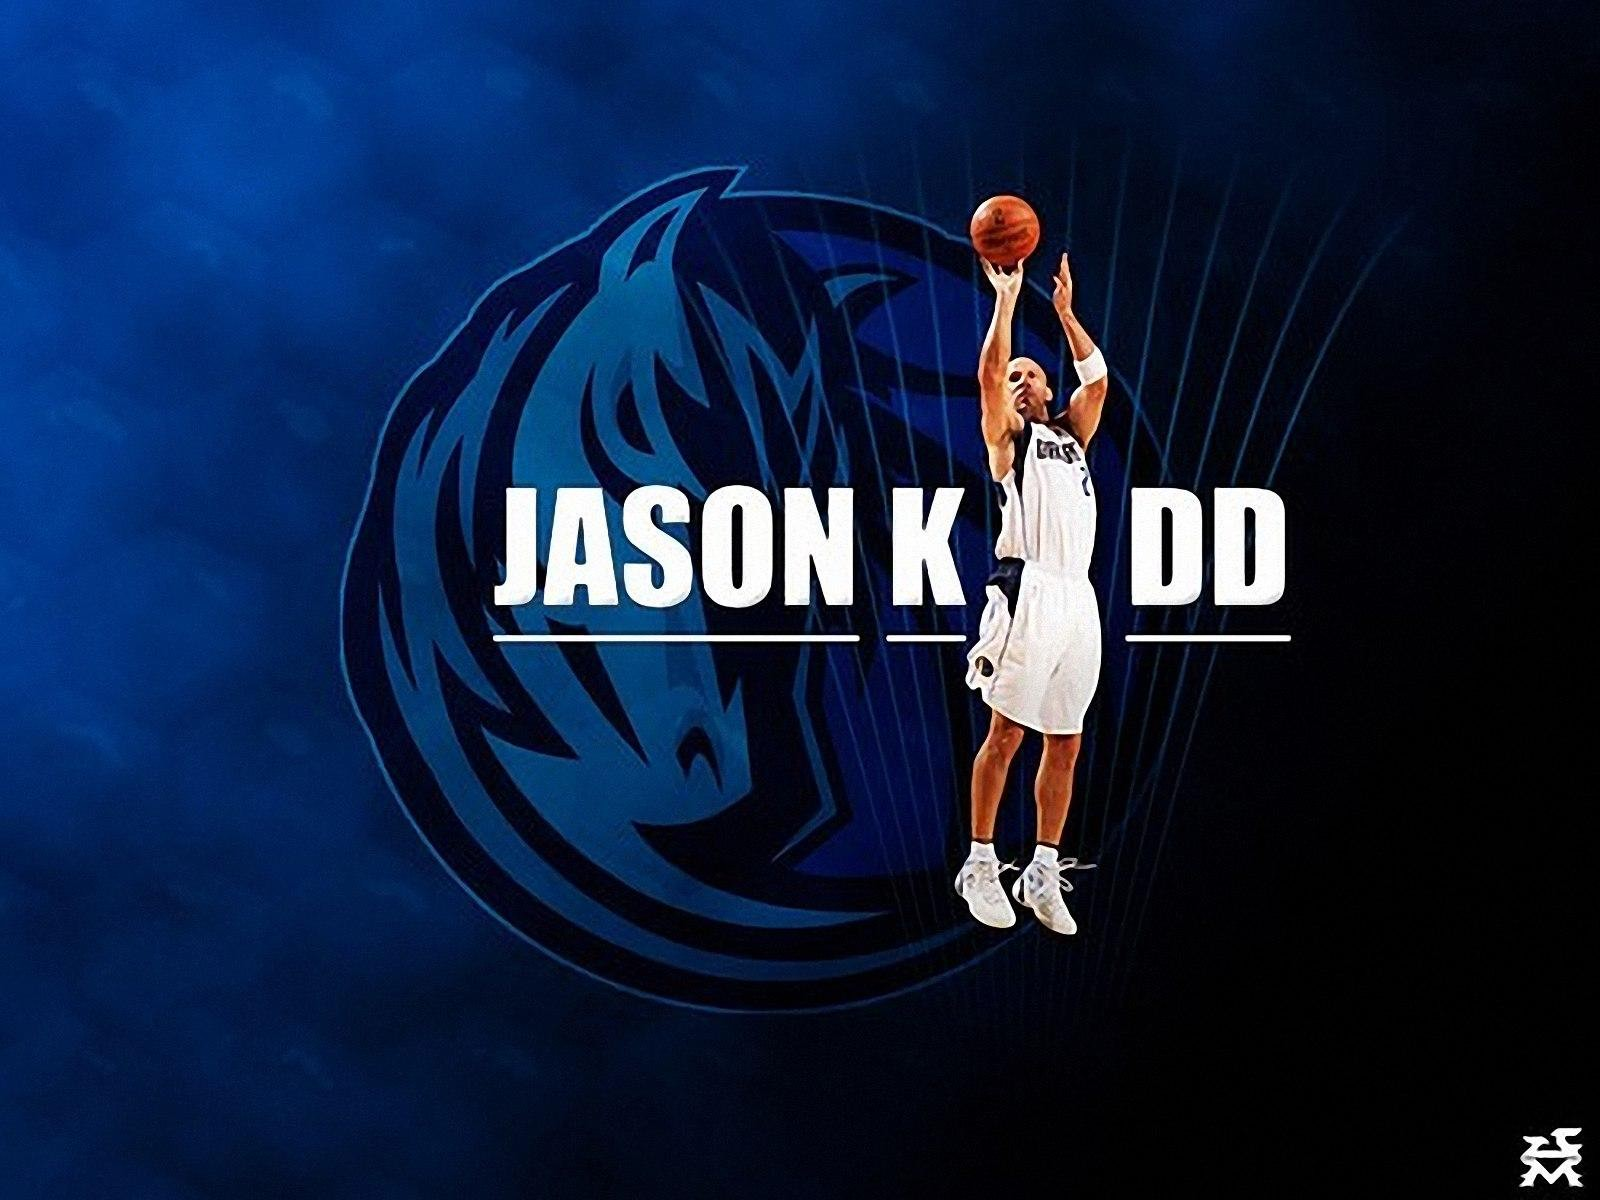 Jason Kidd Desktop - Jason Kidd Desktop